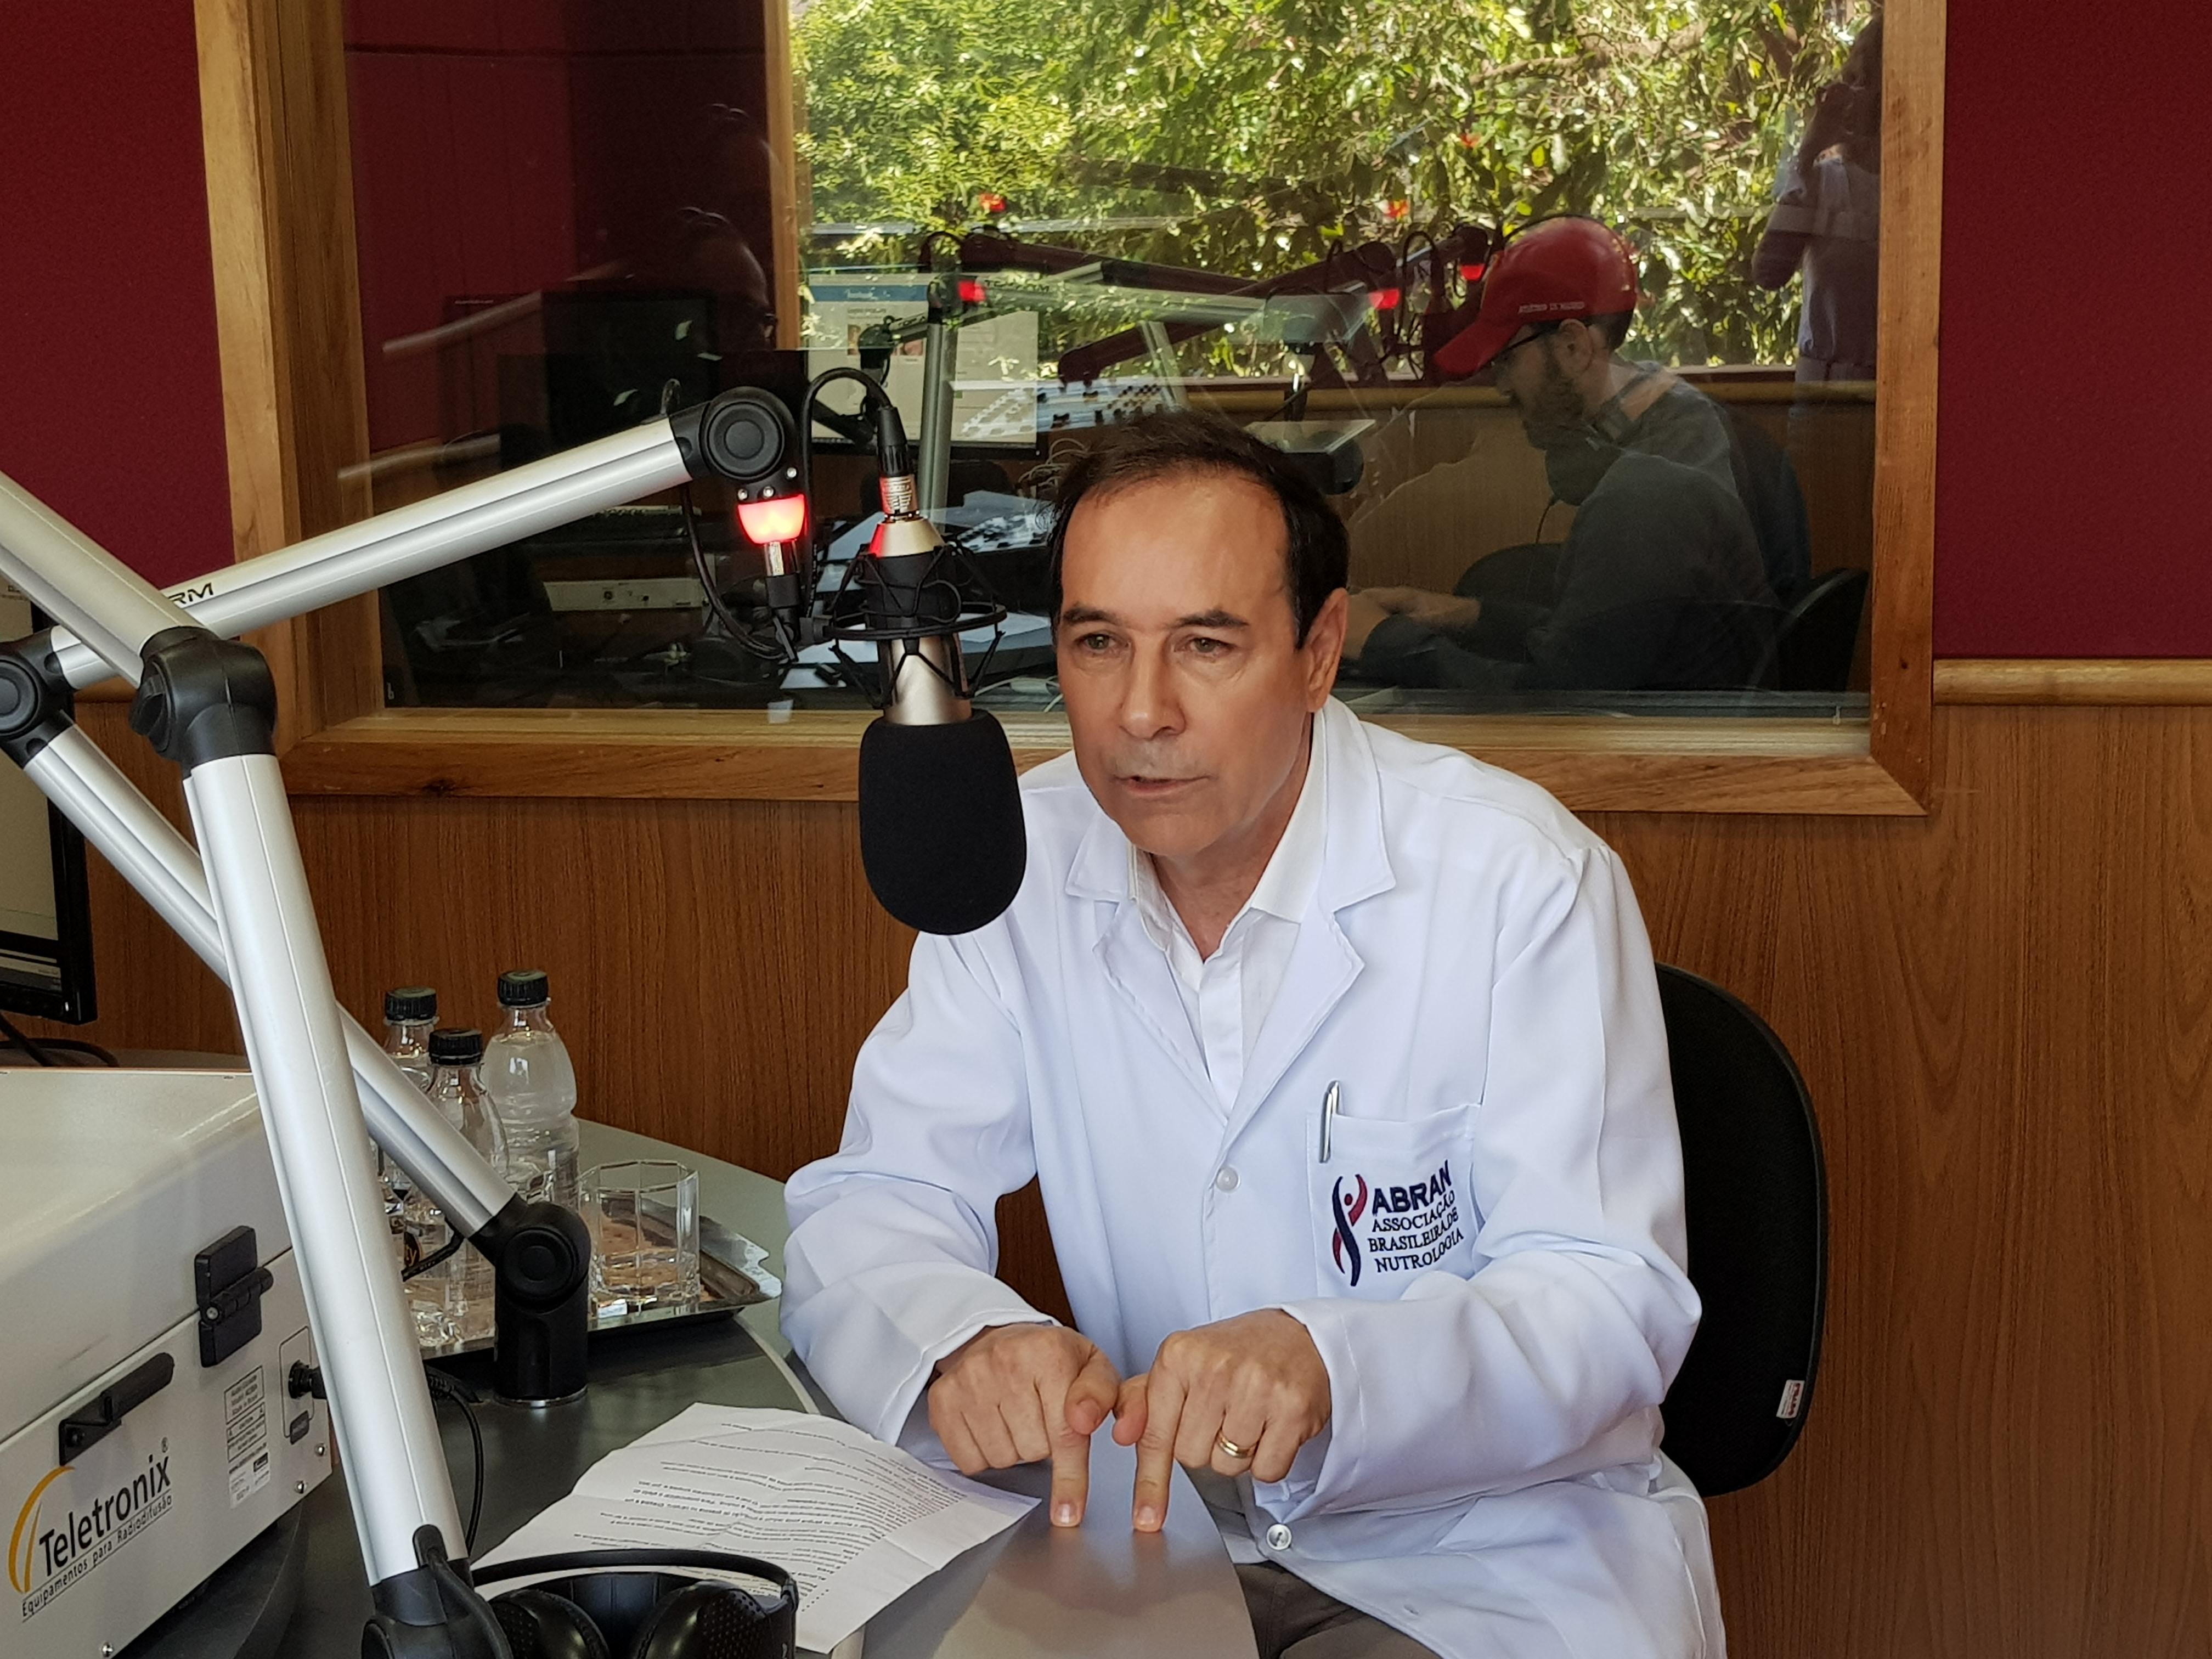 CBN Saúde: As fake news sobre o colesterol